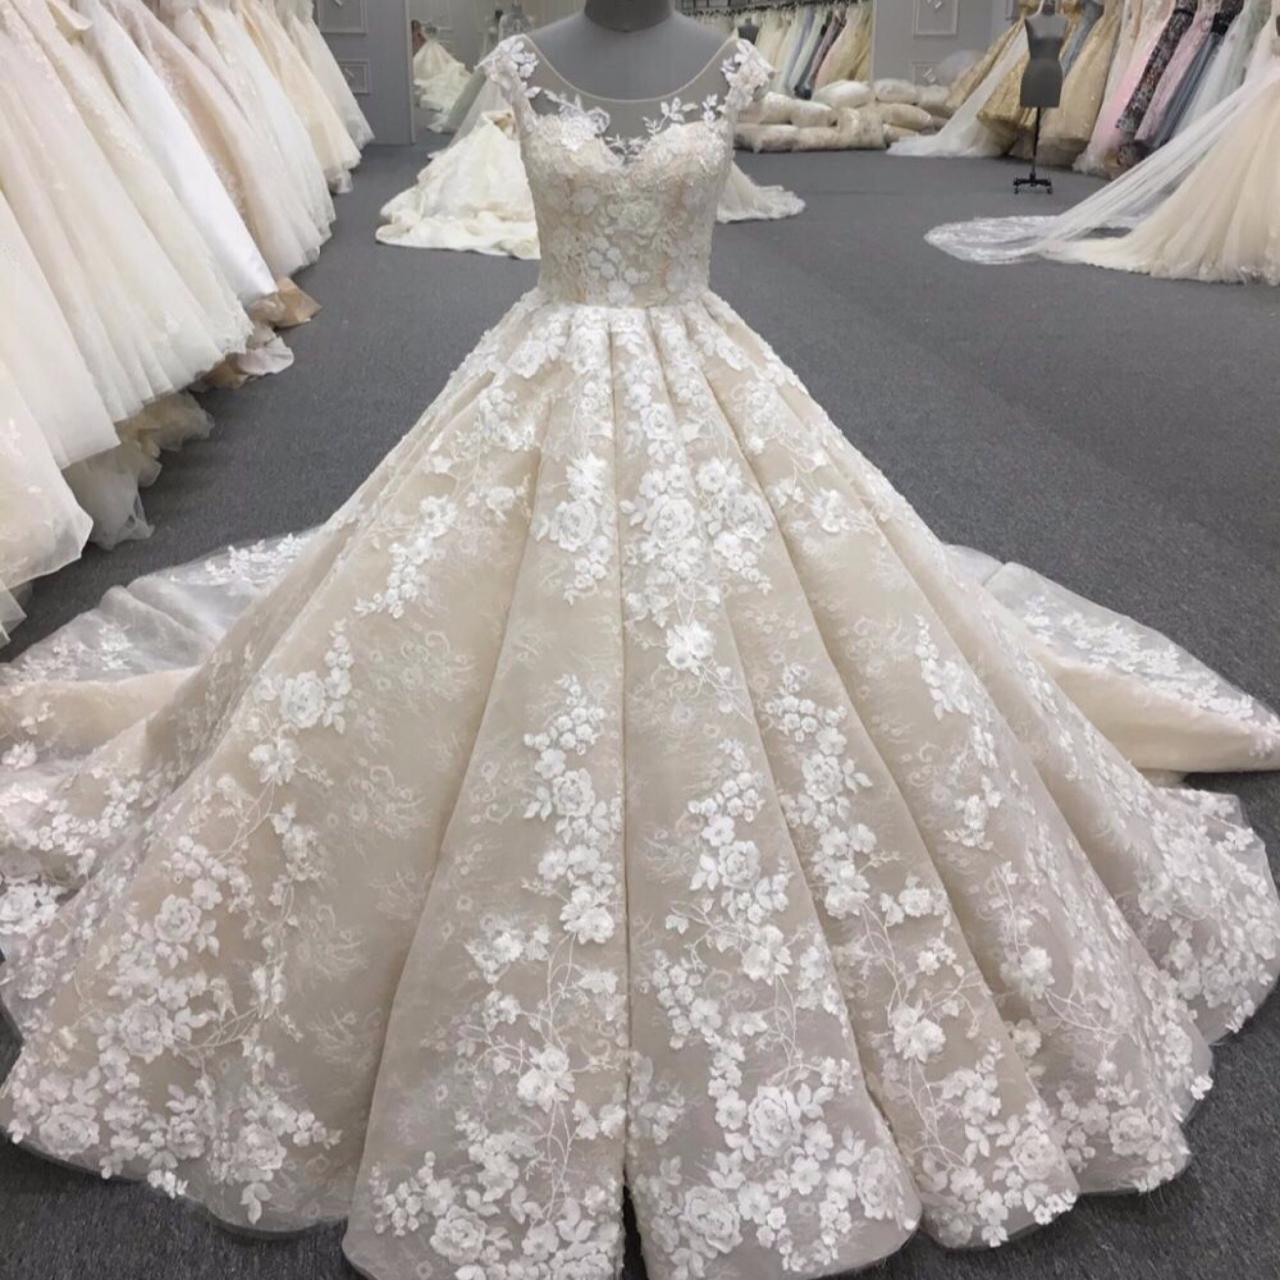 صورة فساتين زفاف فخمه , احدث موديلات فساتين زفاف للعروس